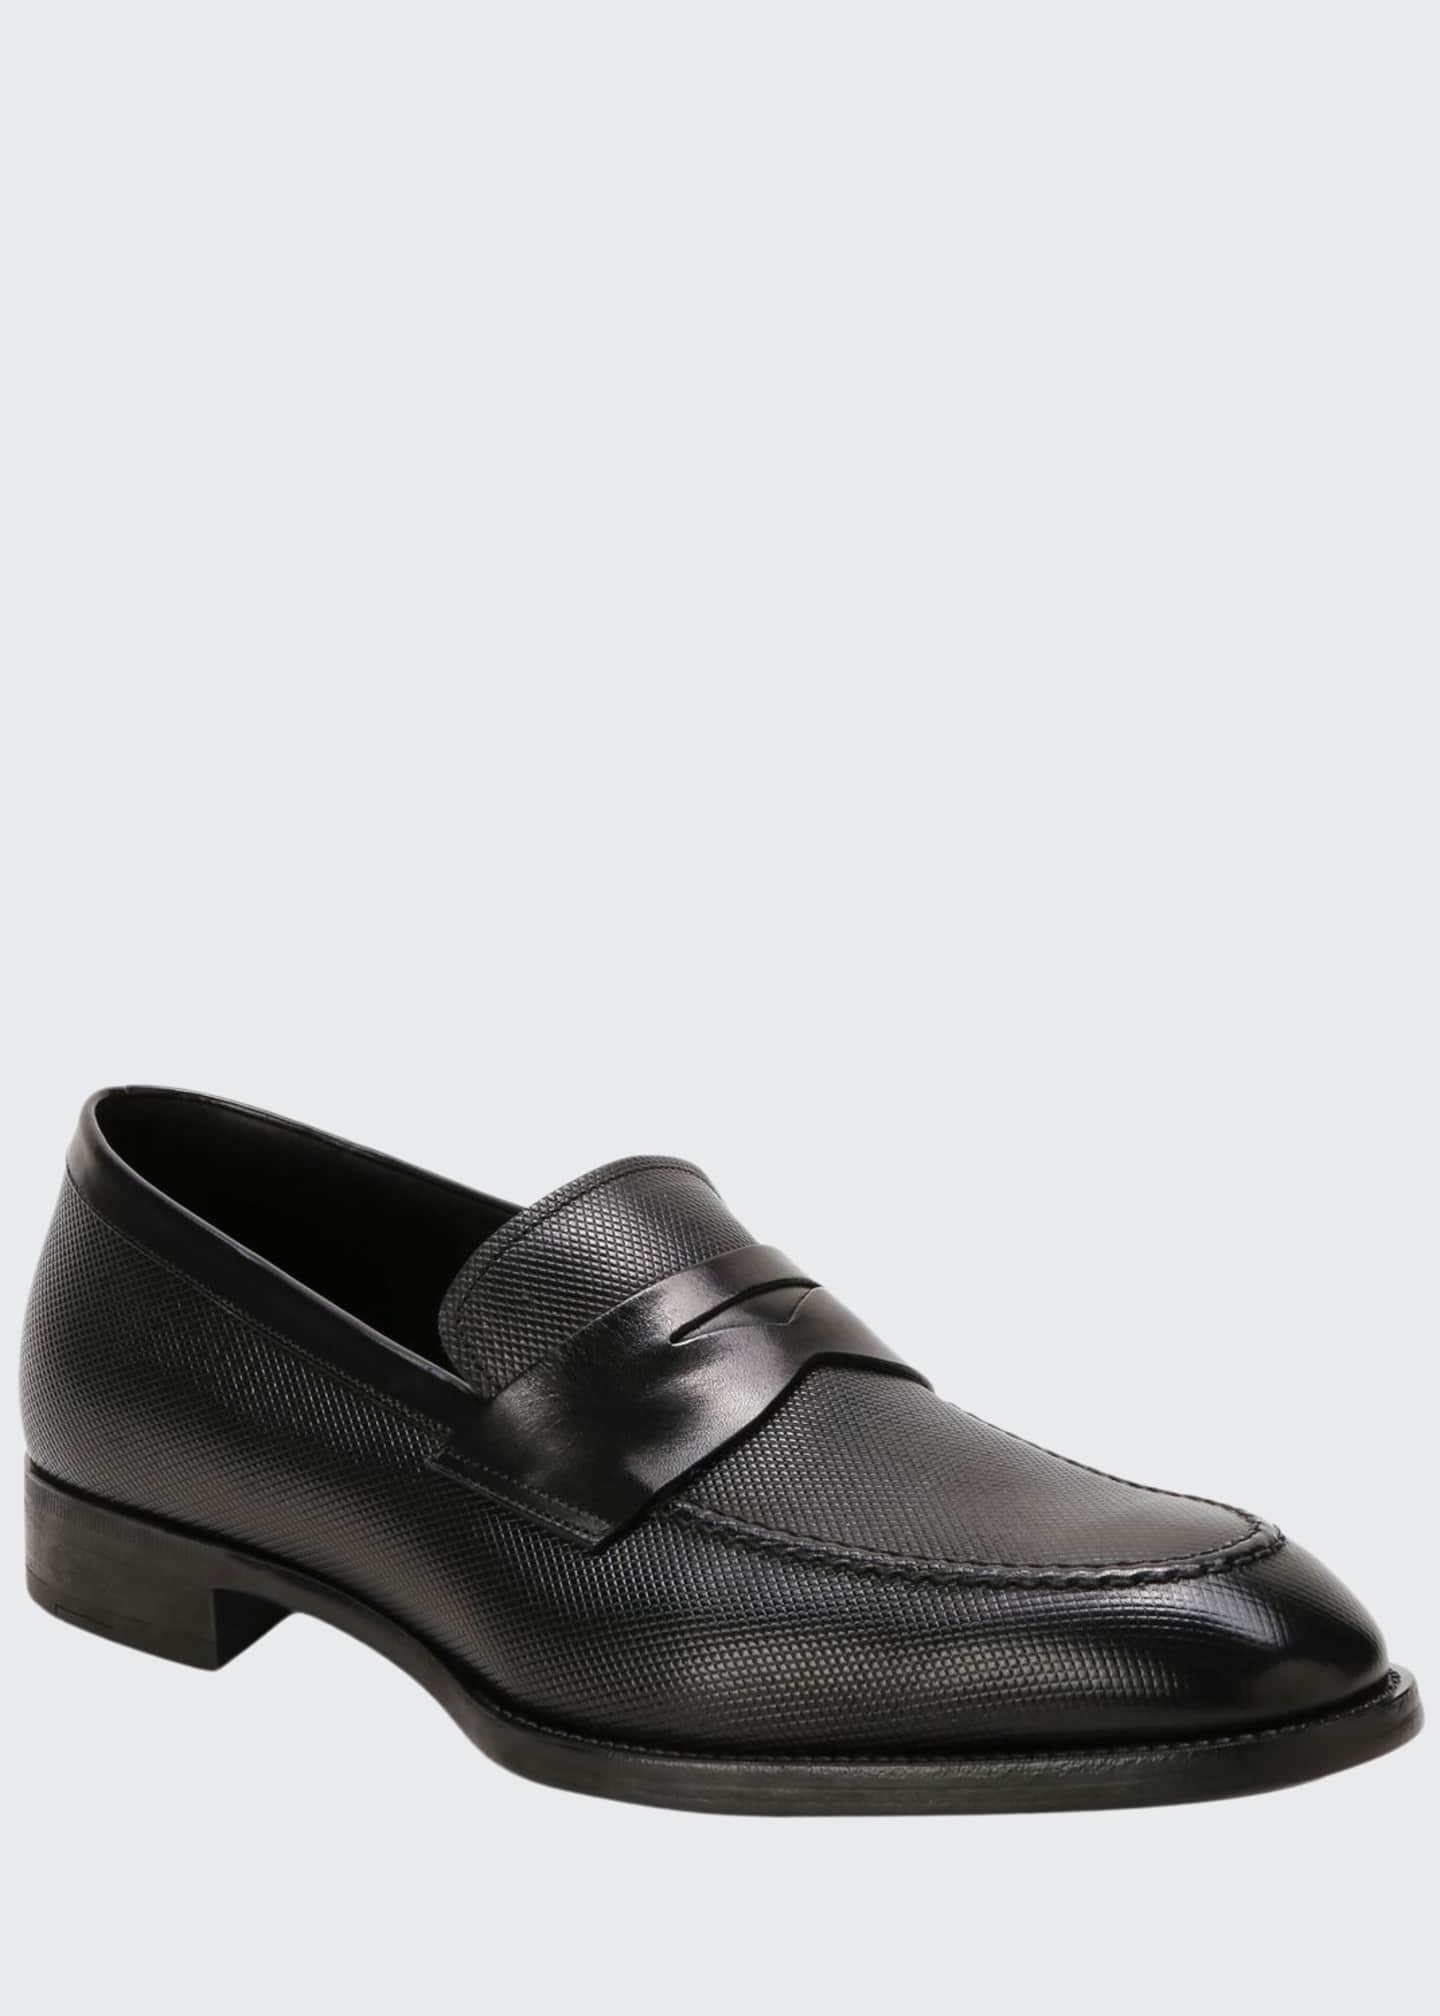 Giorgio Armani Men's Textured Leather Penny Loafers